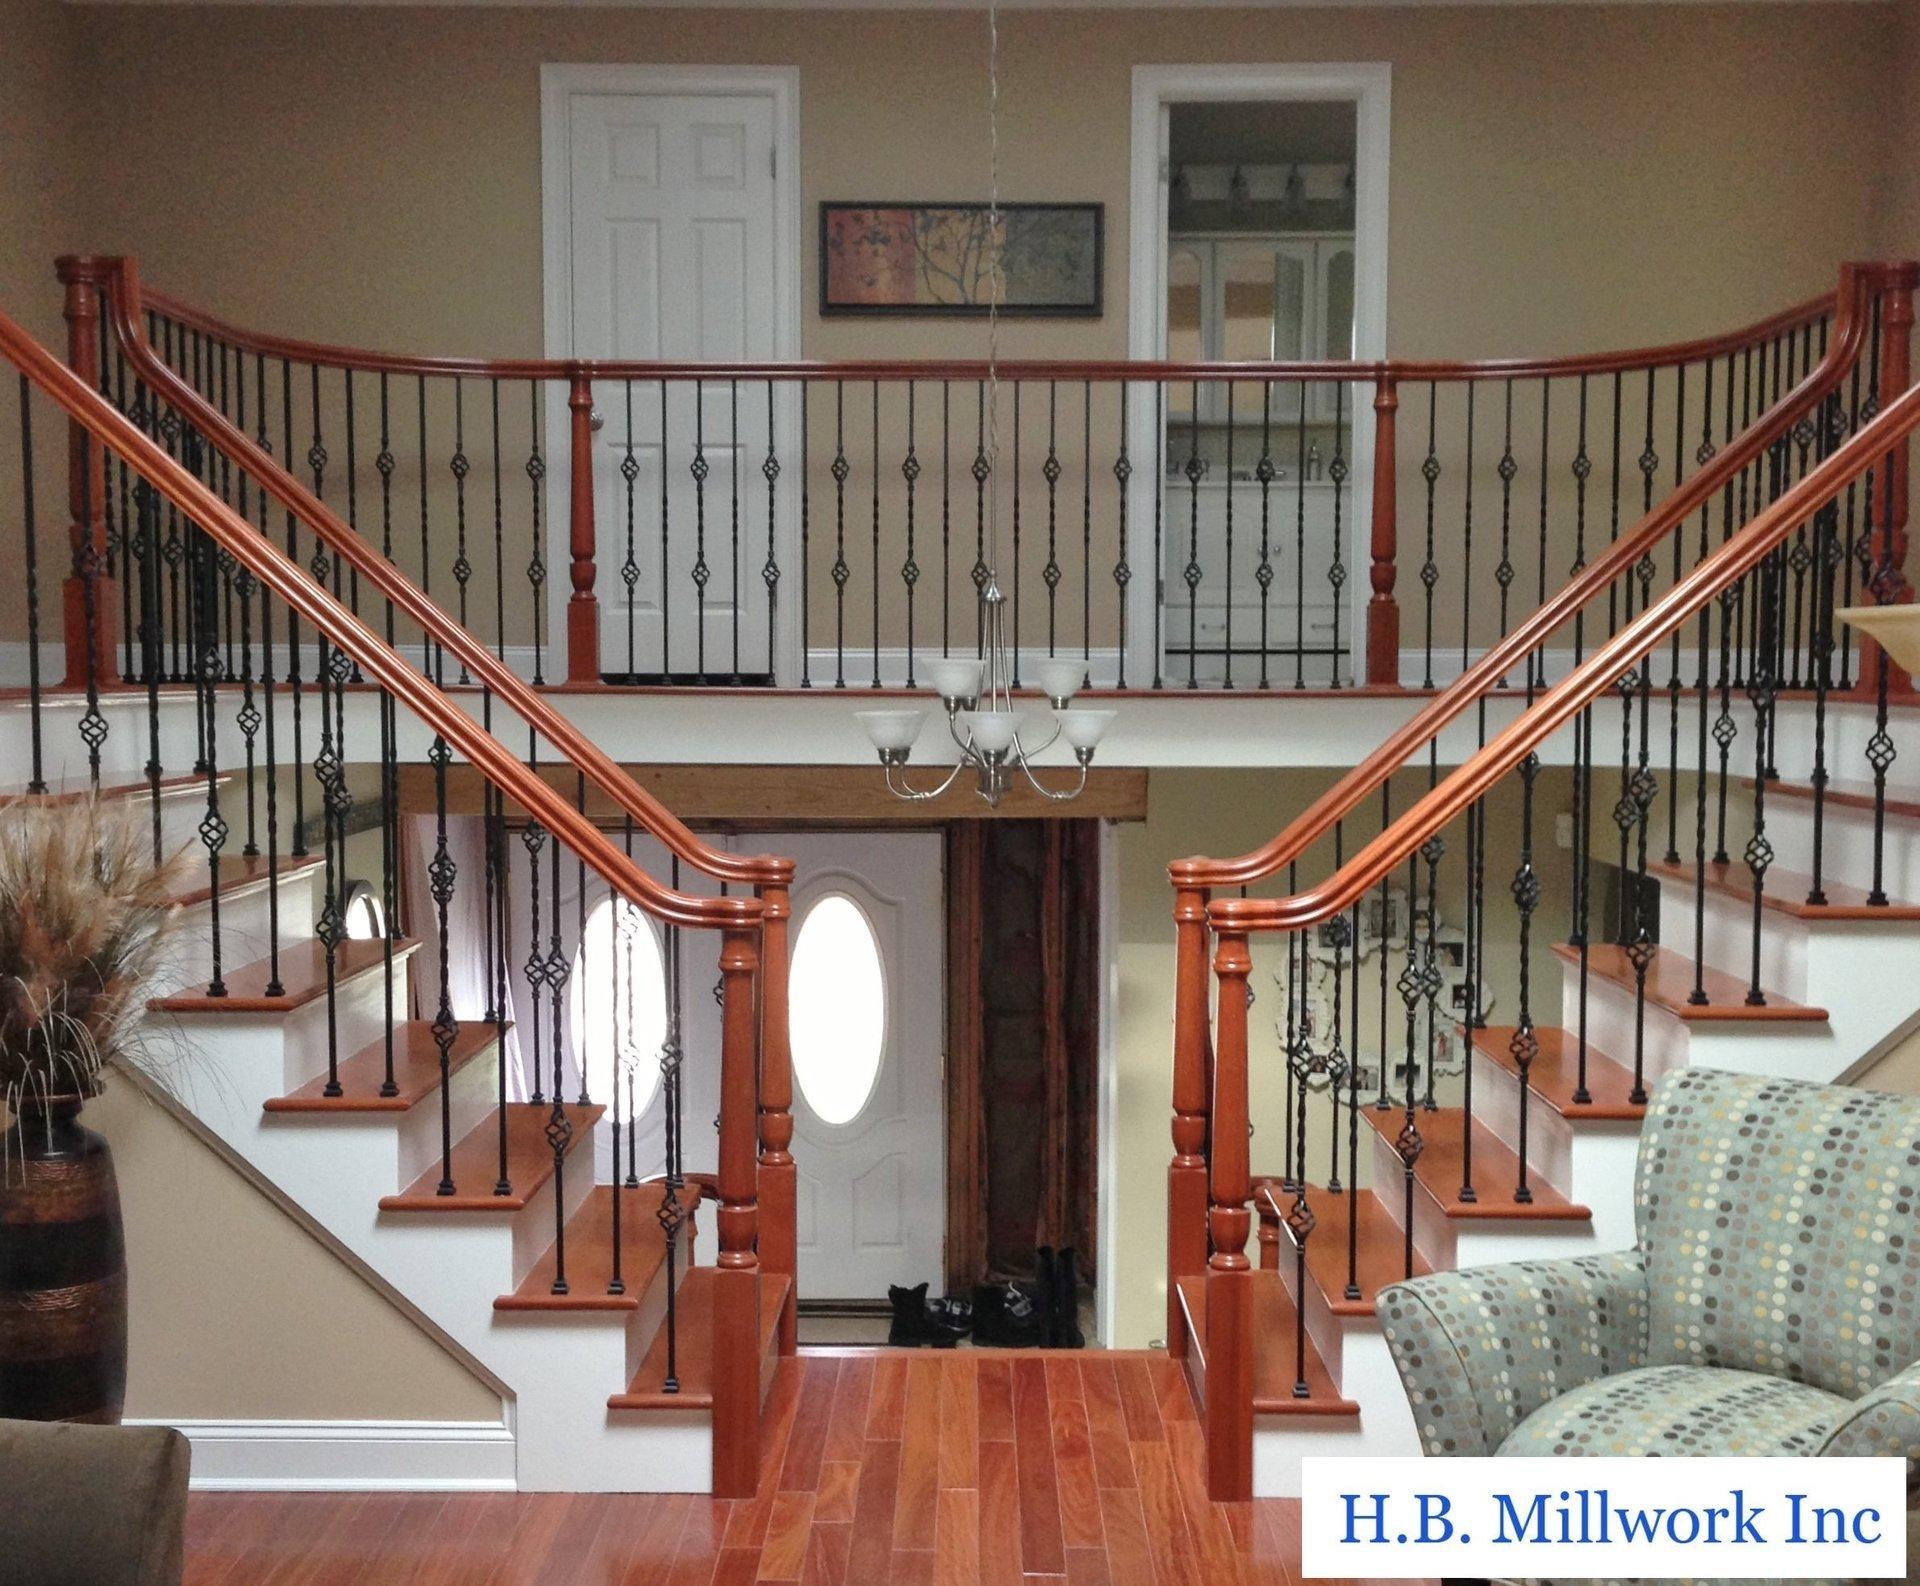 HB Millwork Inc.